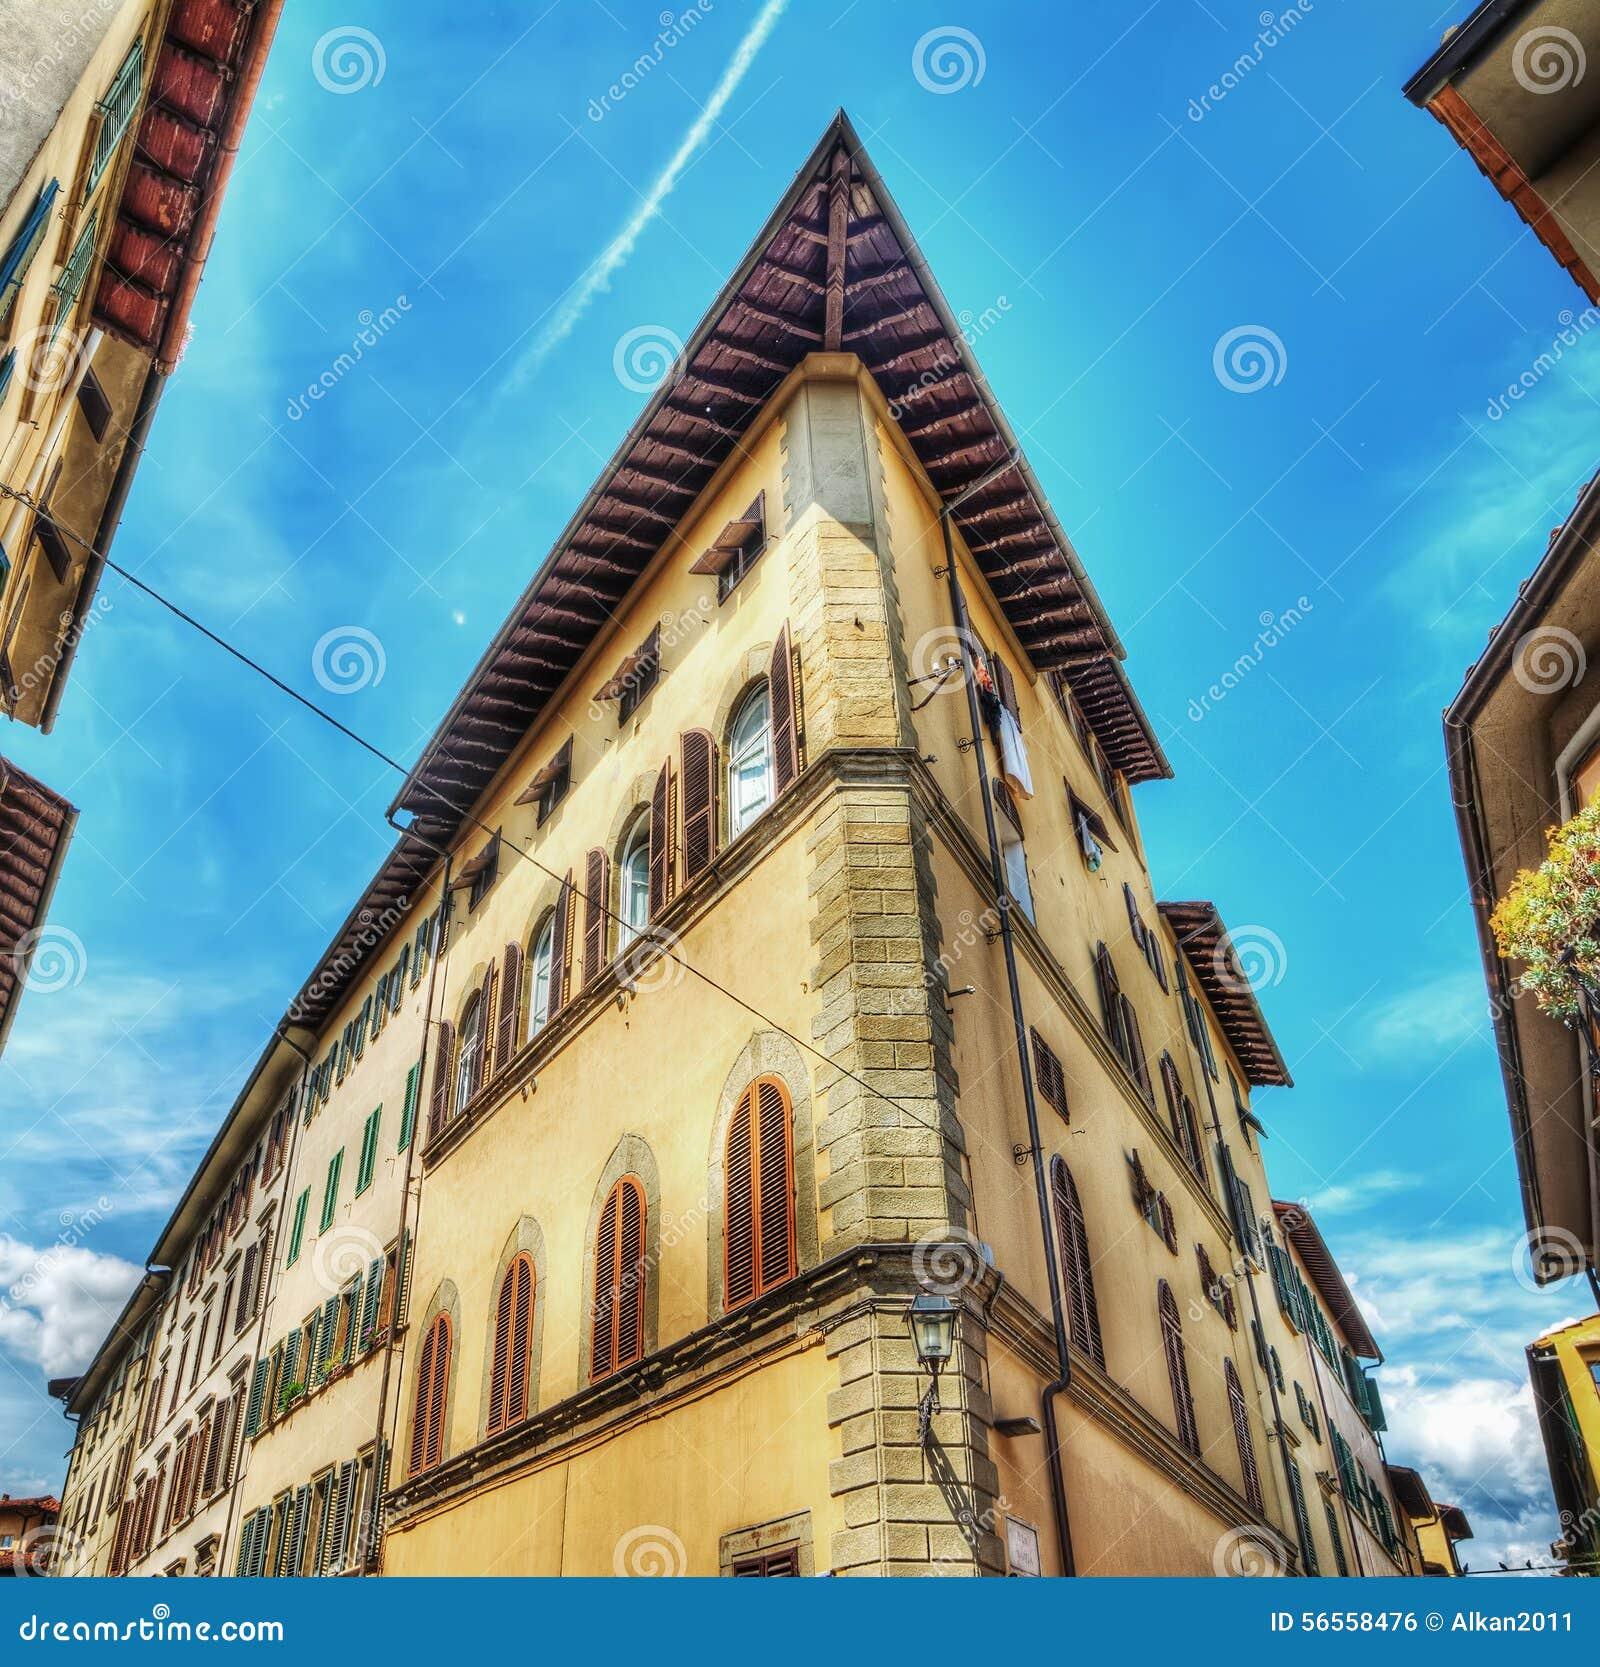 Download Οικοδόμηση που βλέπει από κάτω από στη Φλωρεντία Στοκ Εικόνες - εικόνα από ρωμανικός, φλωρεντία: 56558476